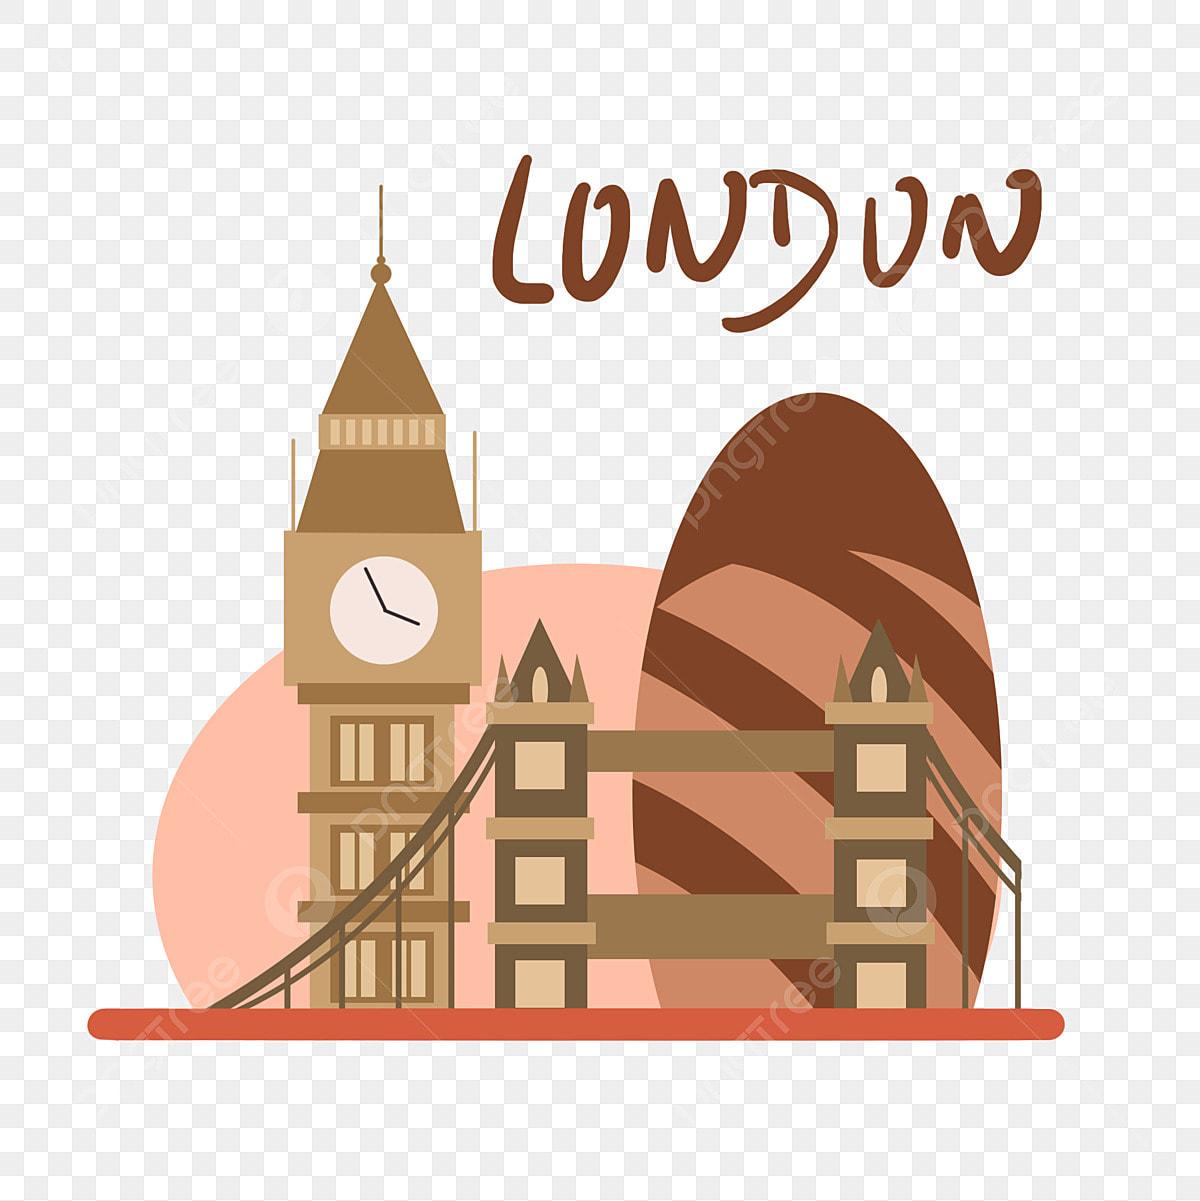 London Uk Landmark City Tourism Png Building City Landmark Travel London Png Transparent Clipart Image And Psd File For Free Download